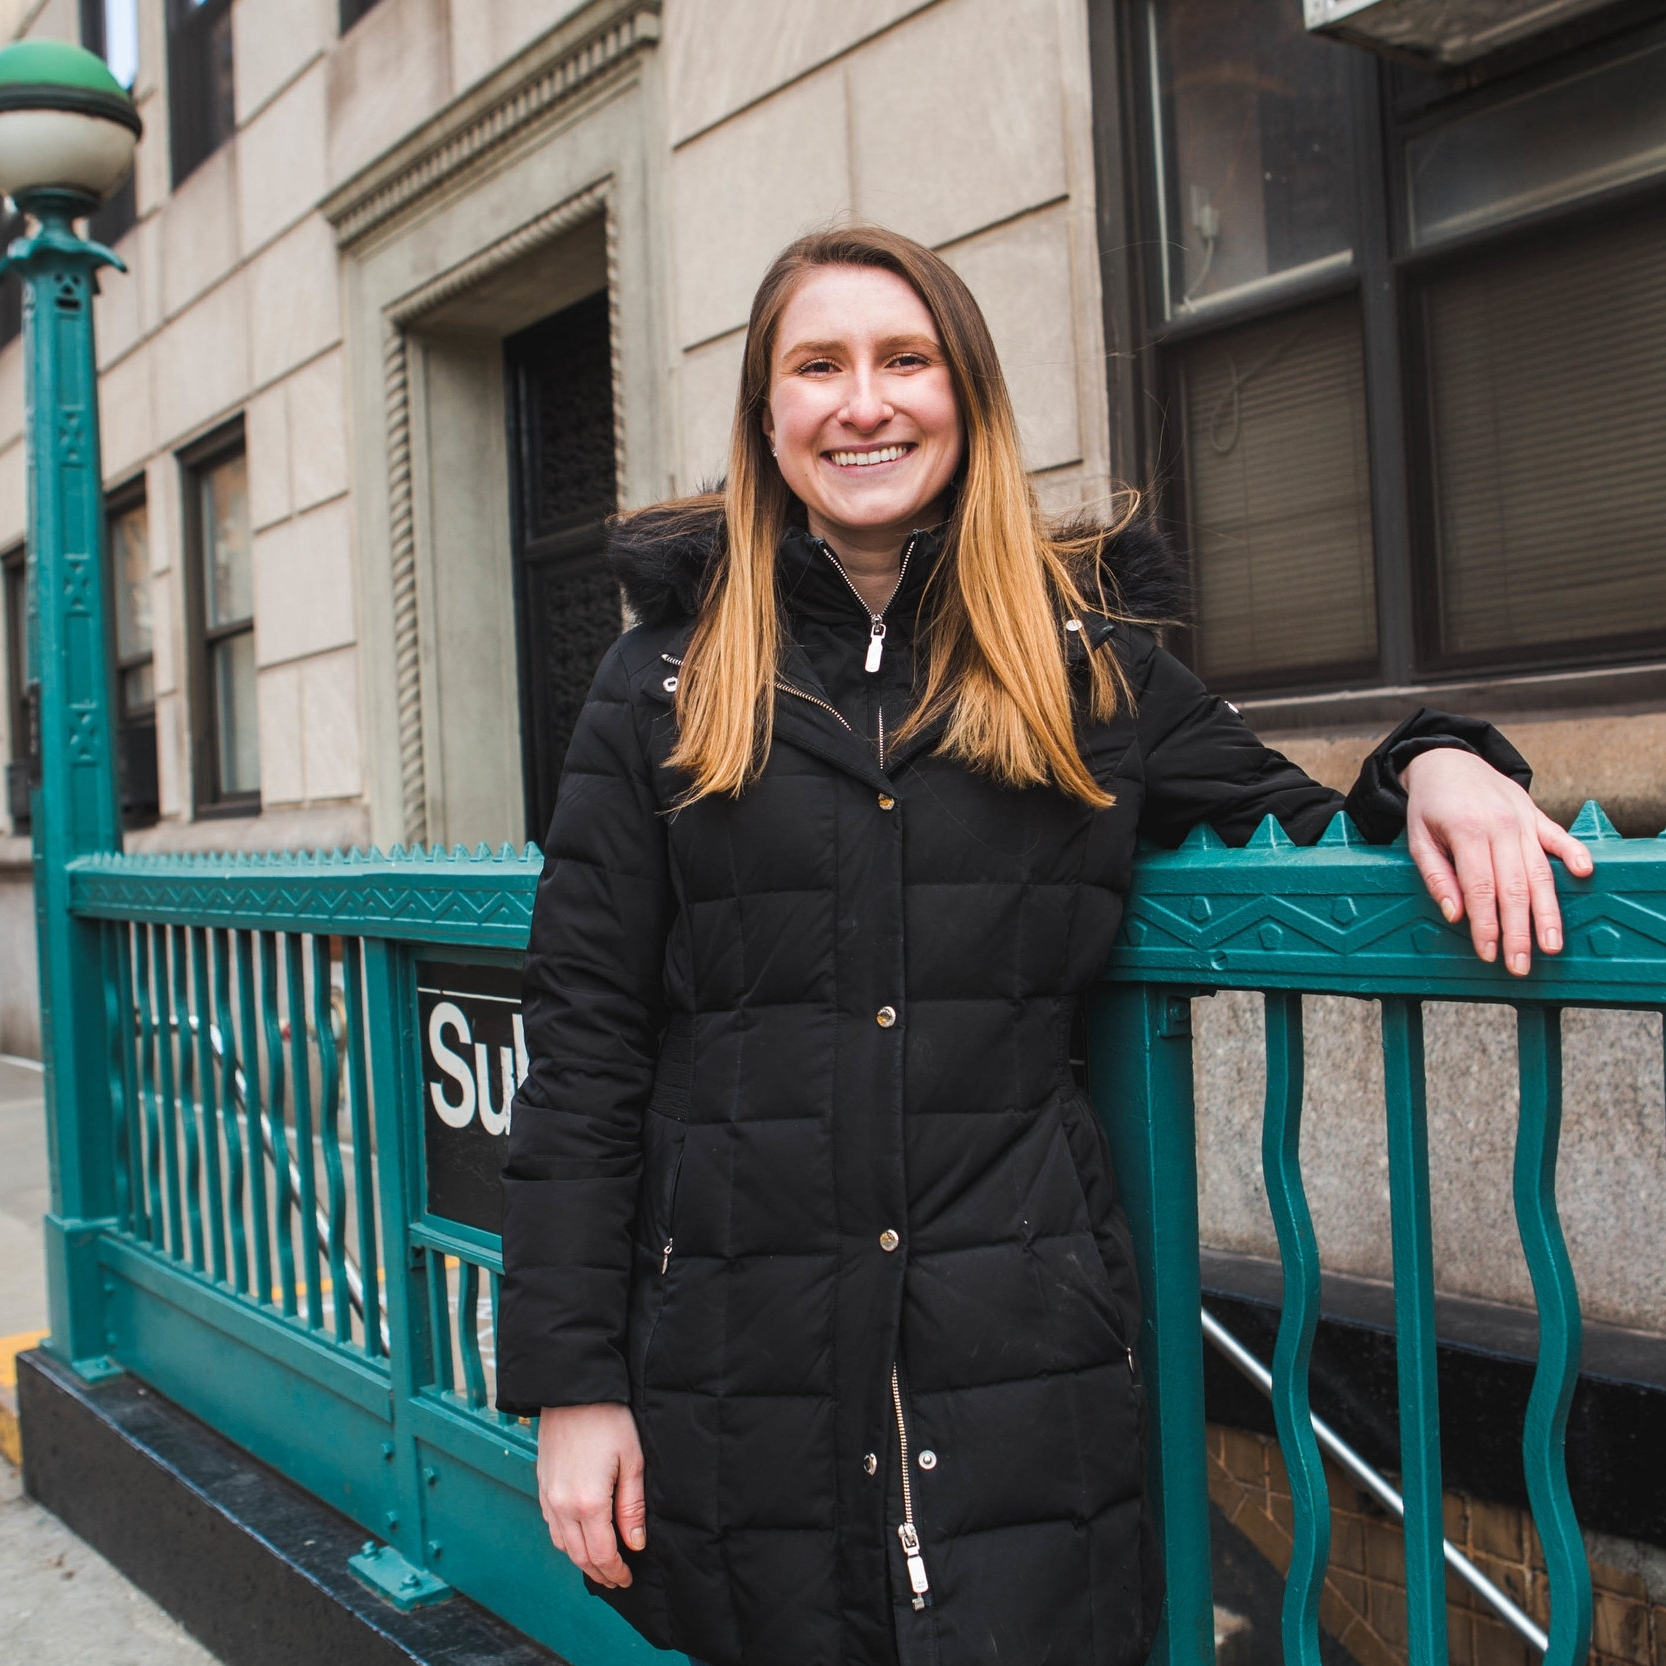 Natalie - NYC, USA